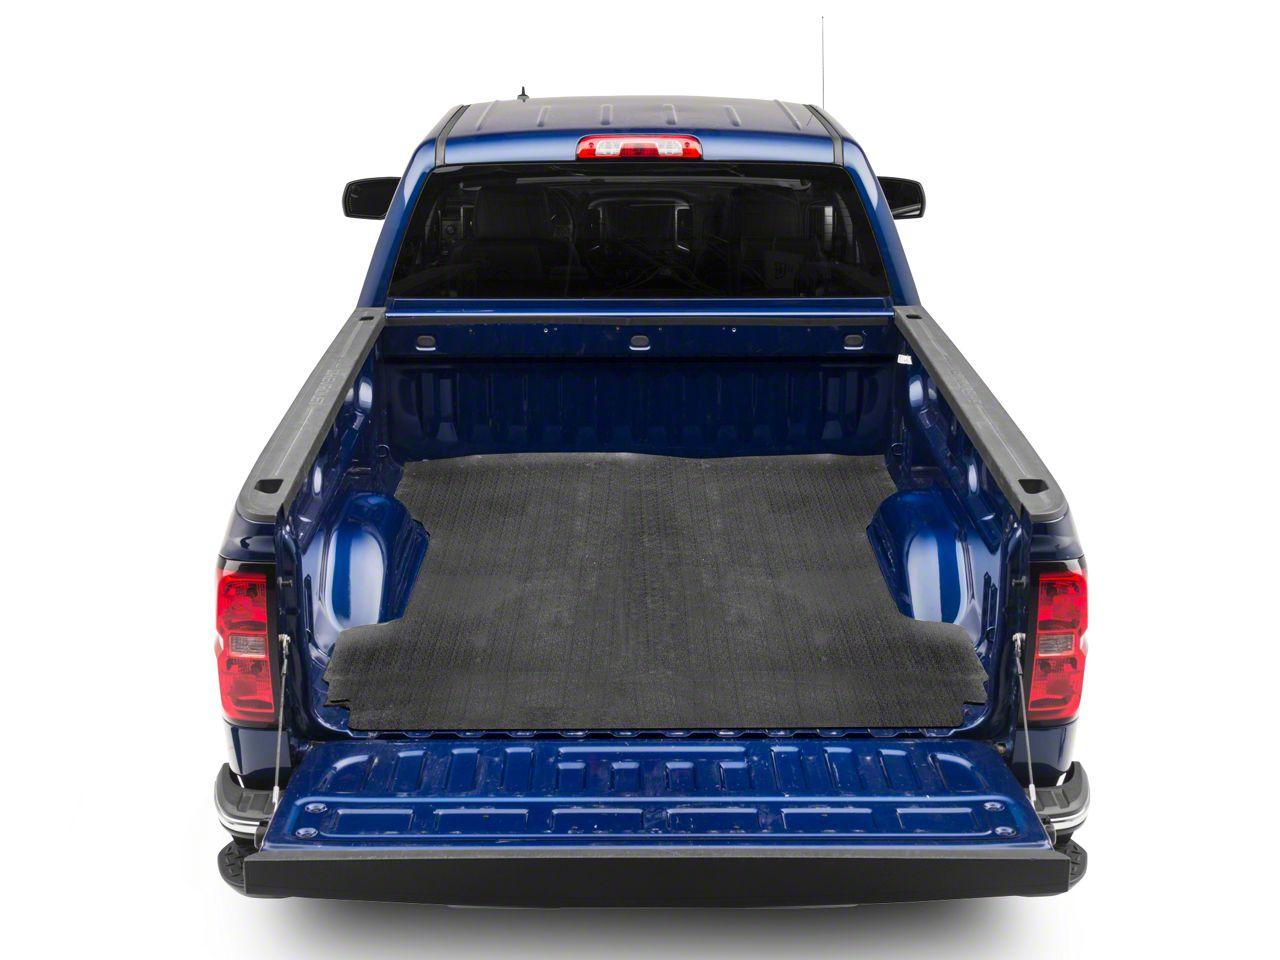 HD Rubber Bed Mat (07-18 Silverado 1500 w/ Short & Standard Box)